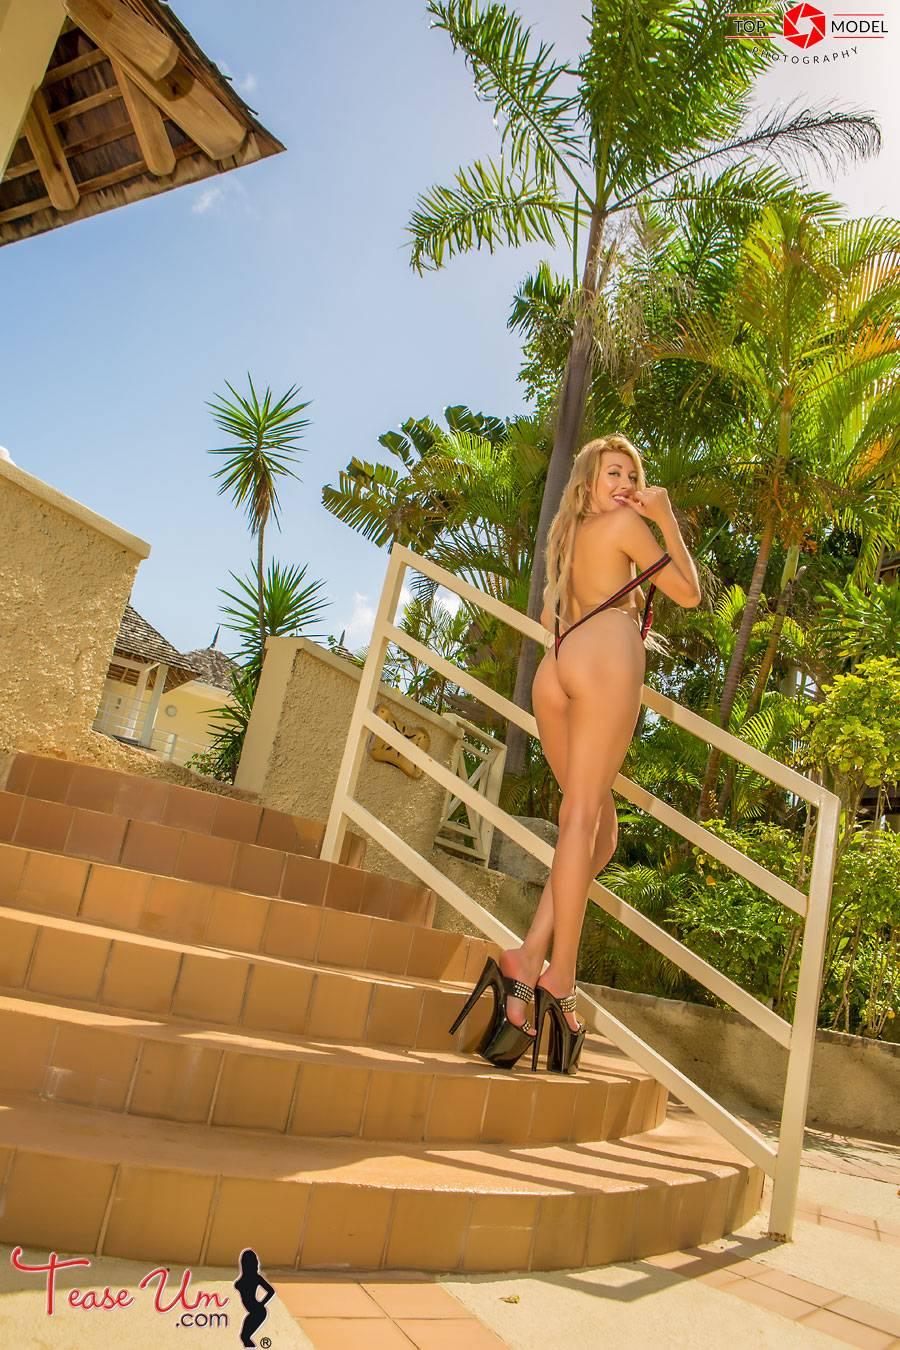 teaseum model lyndsey love nude slingshot pics thumb 2